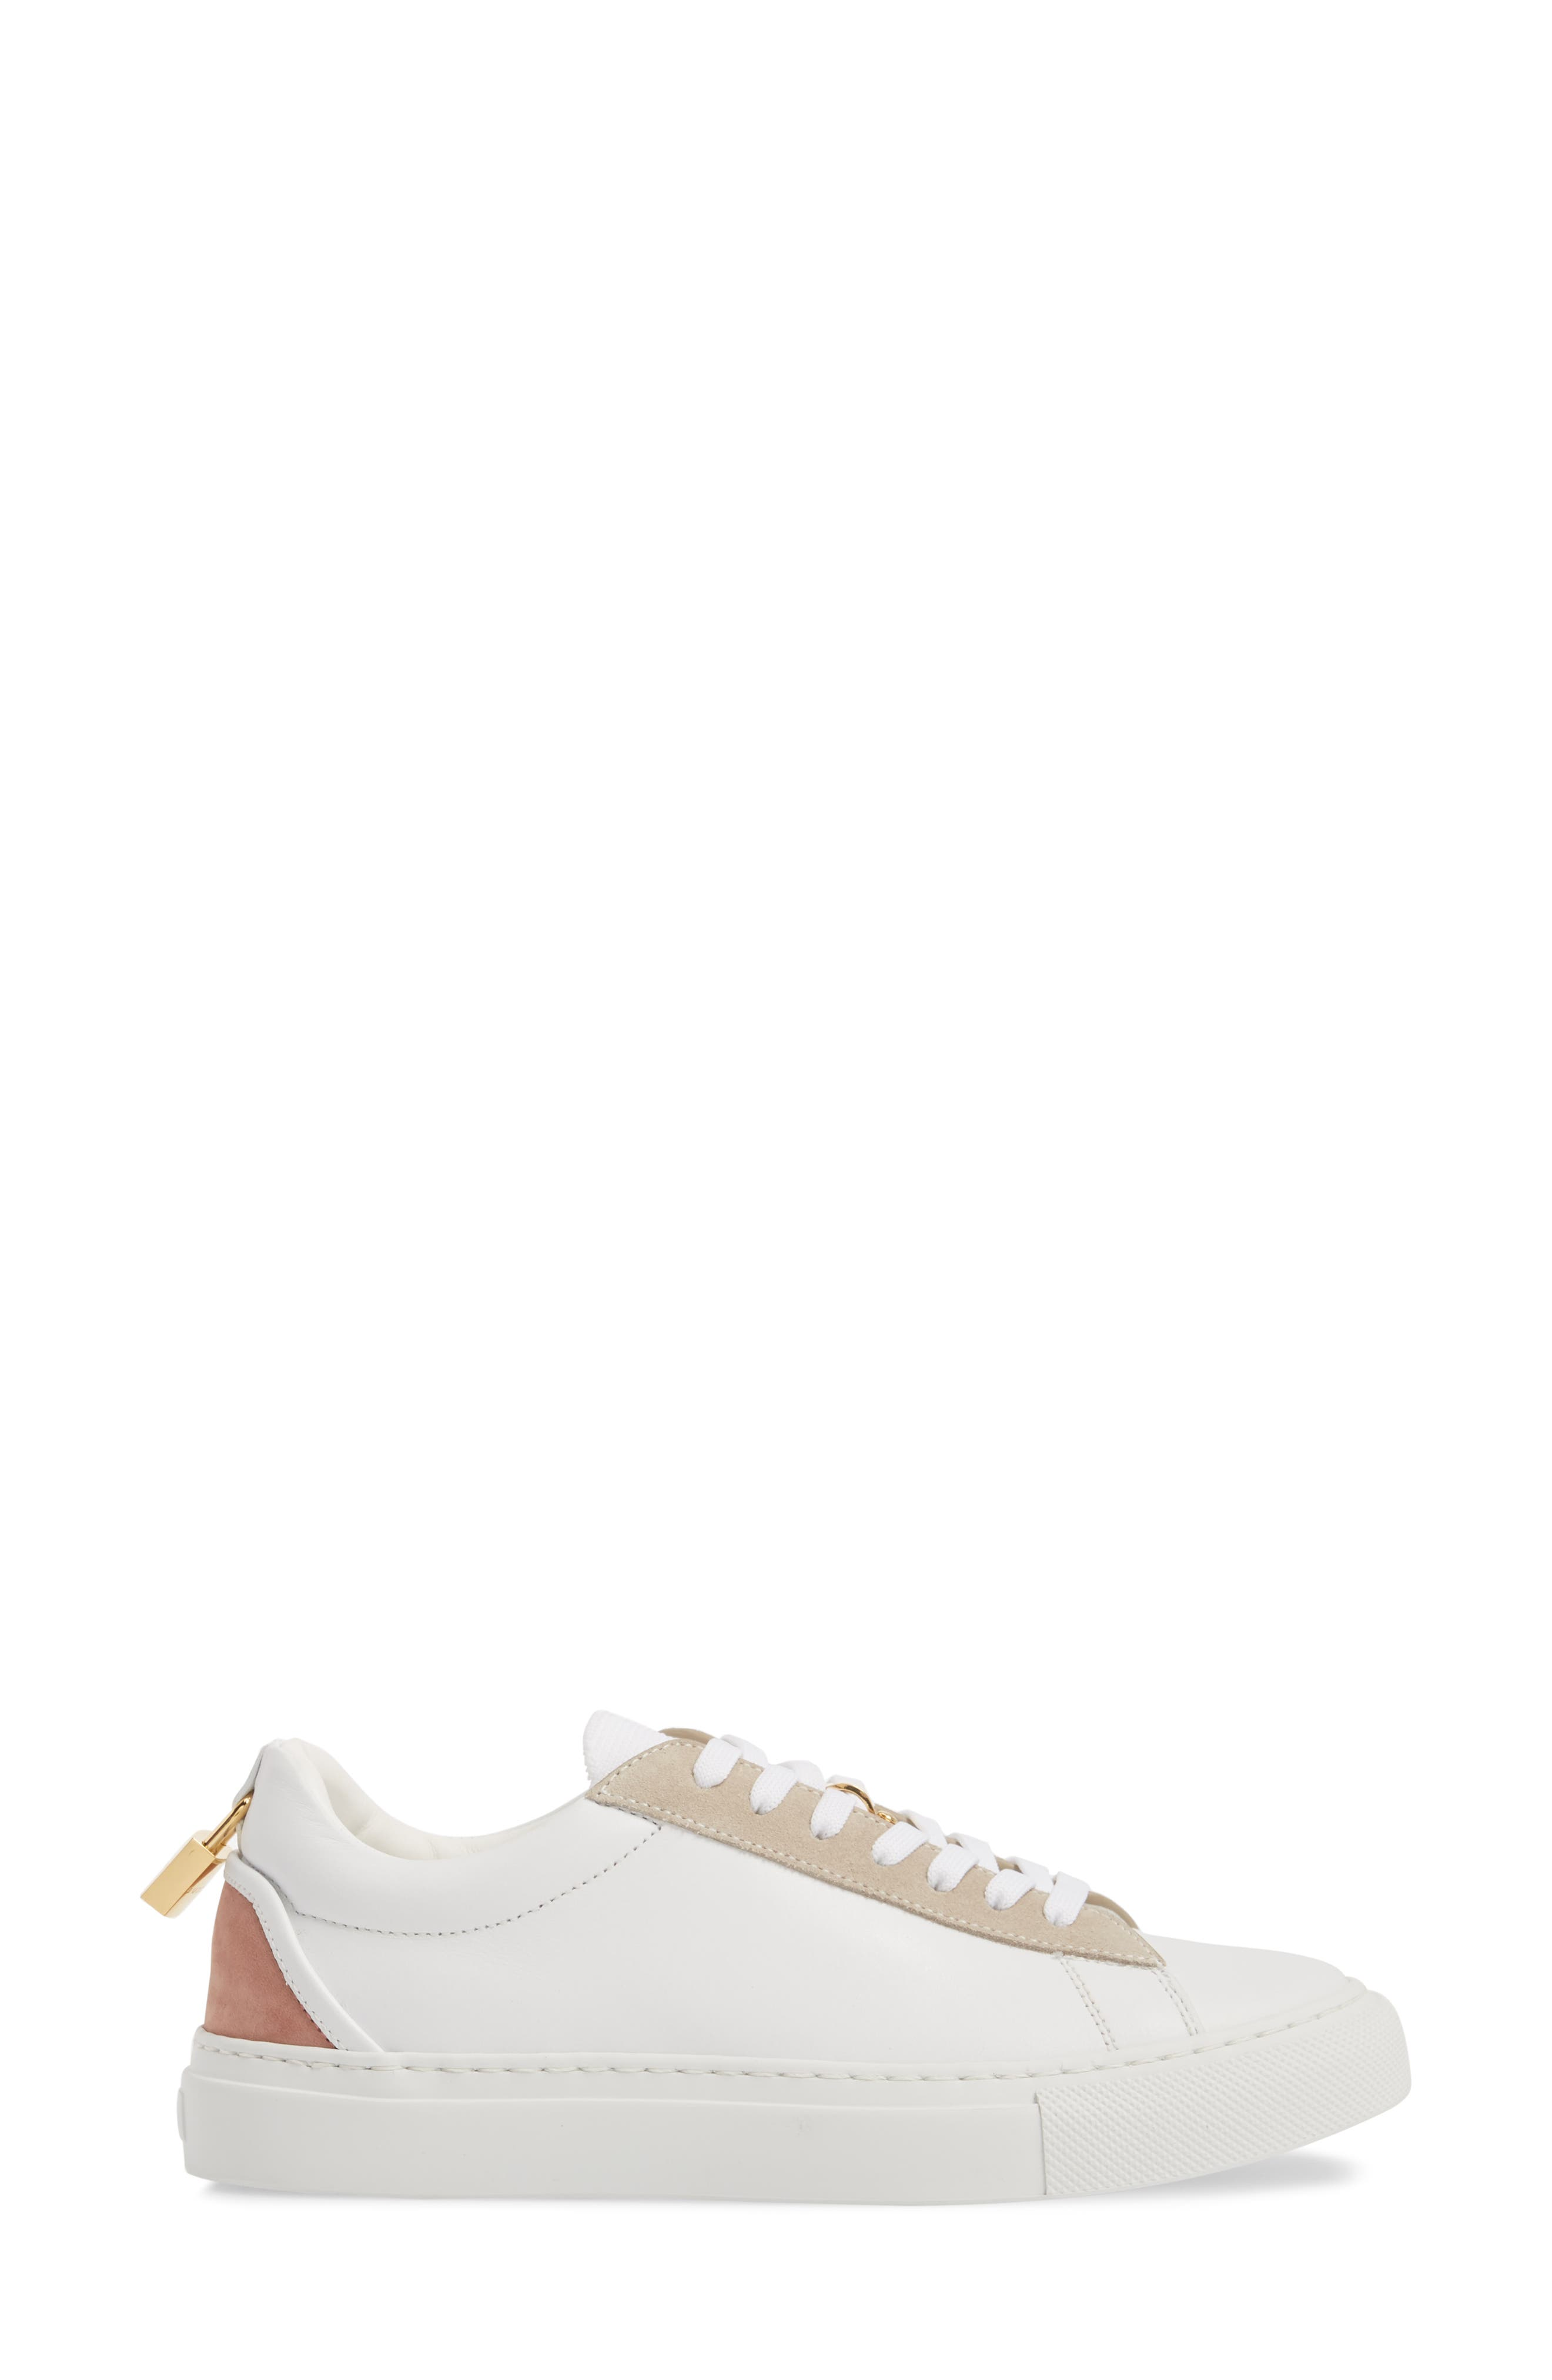 Tennis Lock Sneaker,                             Alternate thumbnail 4, color,                             White/ Dusty Pink